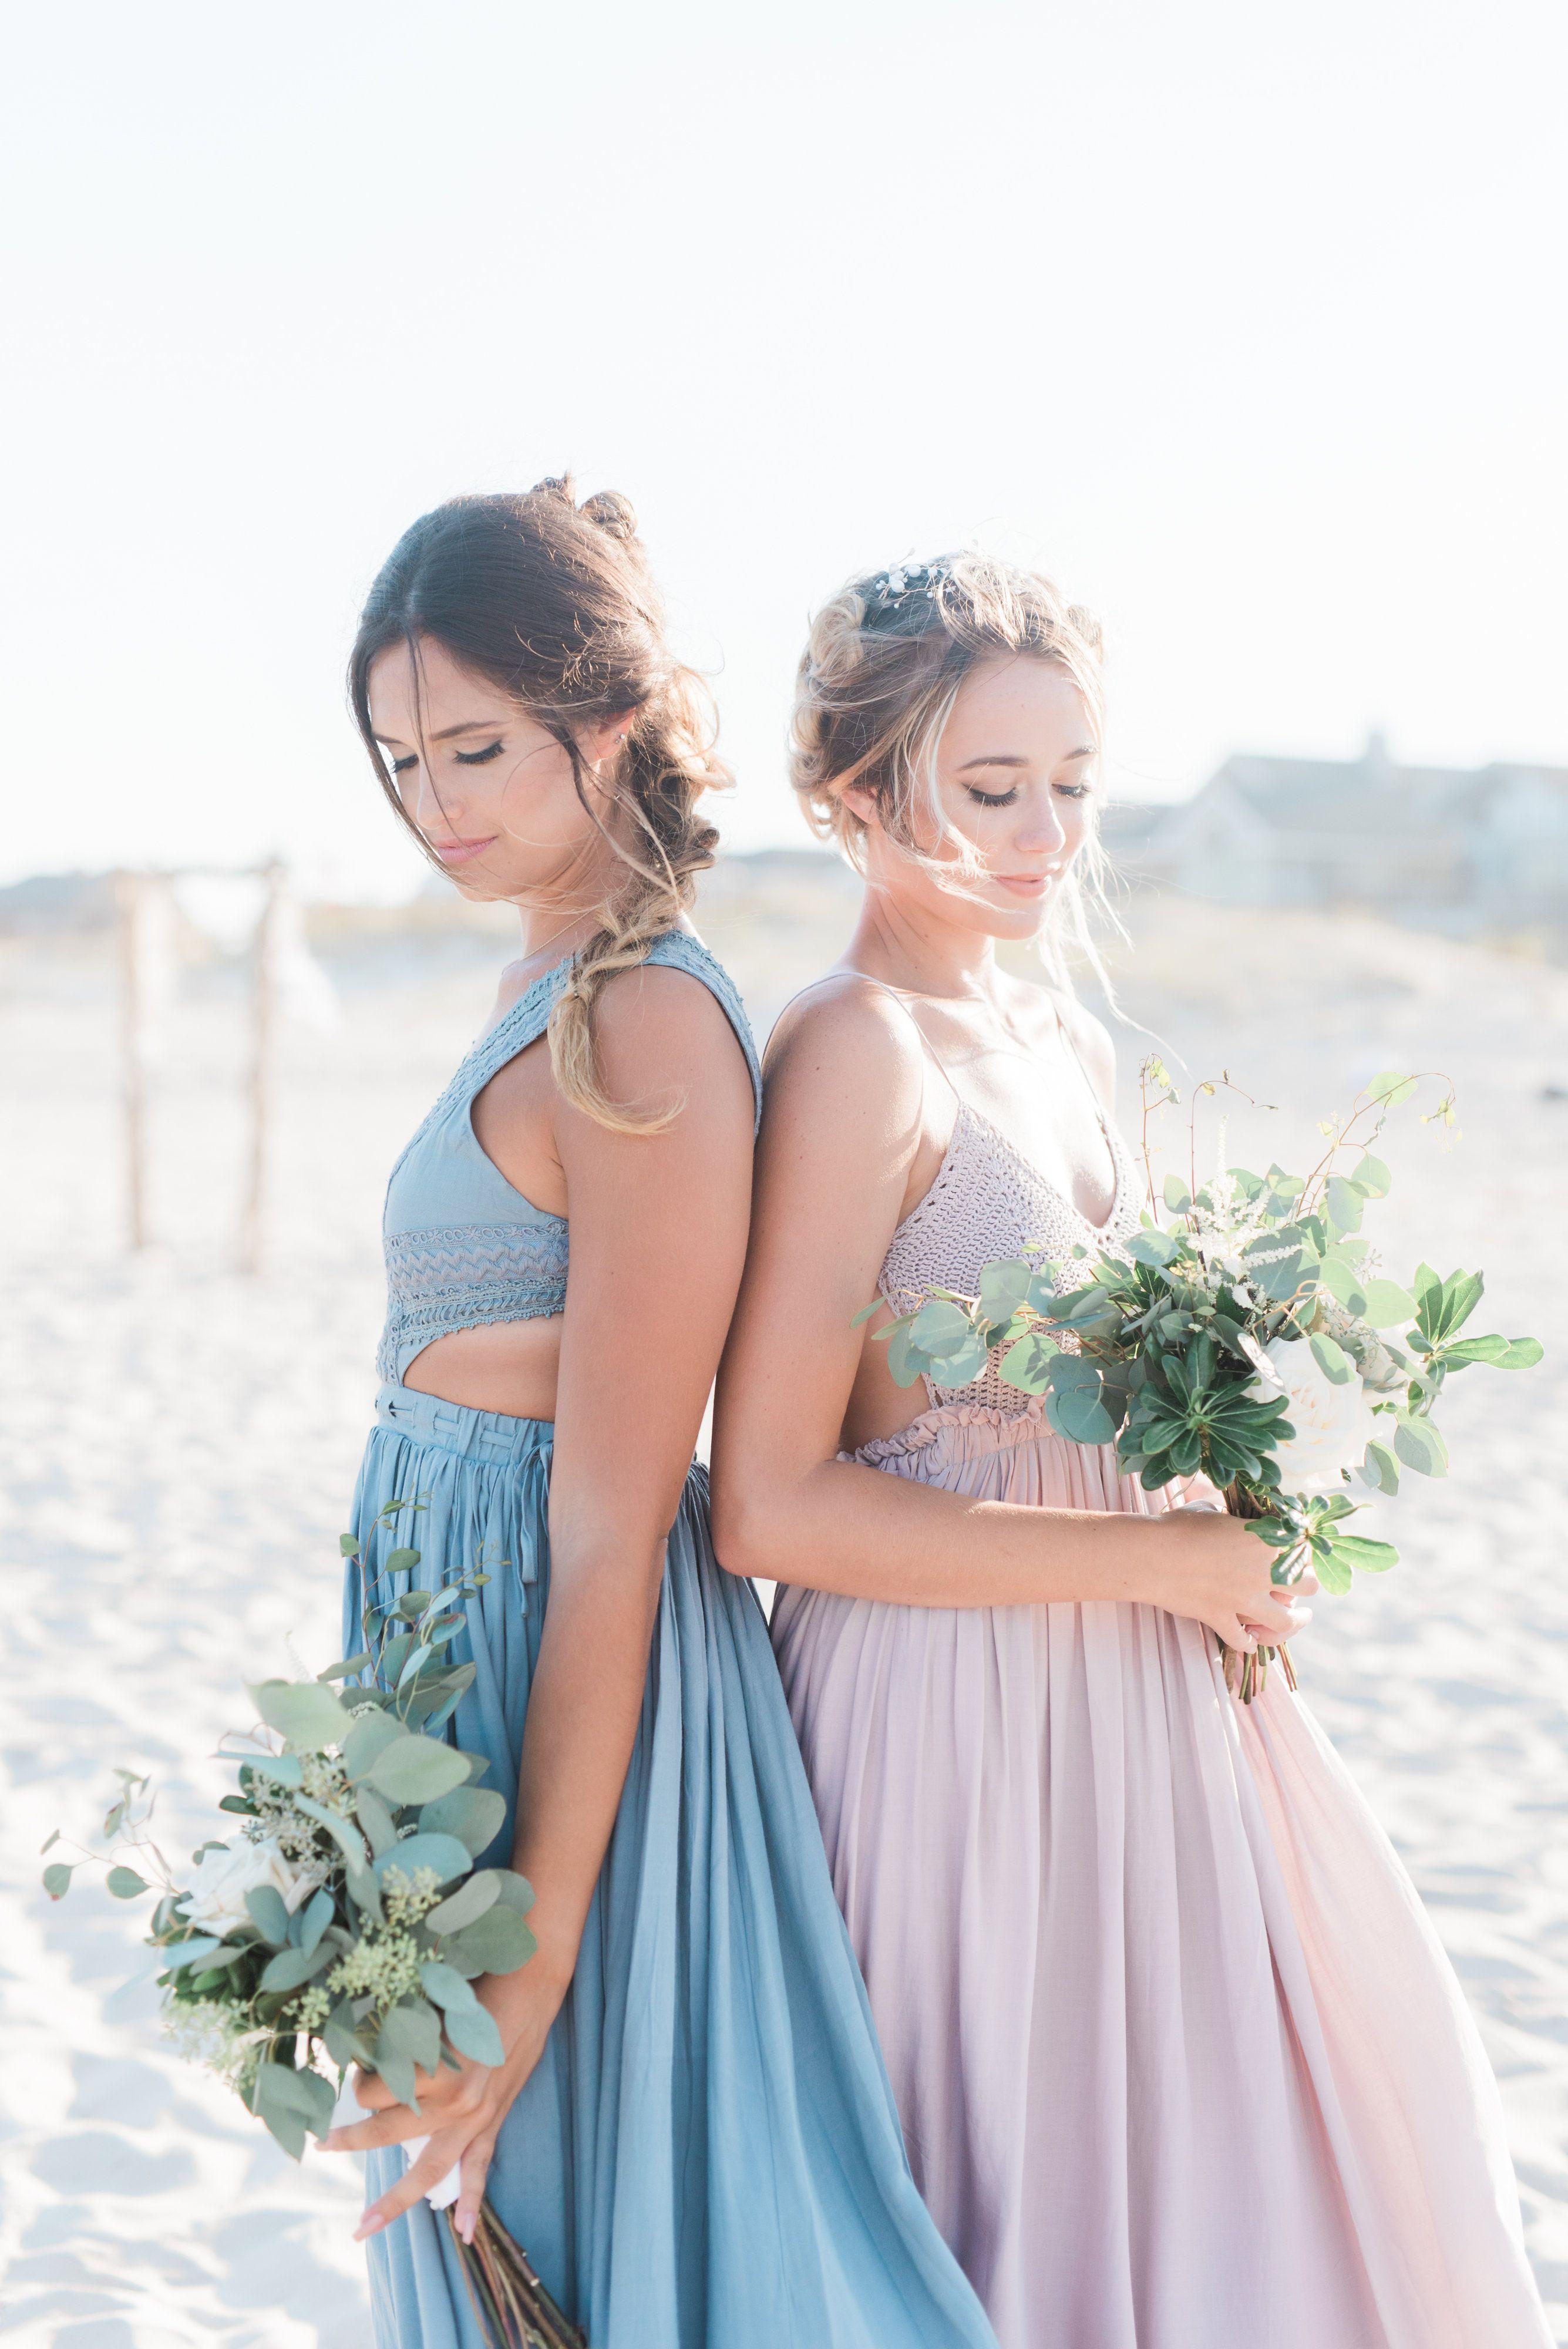 a4fb01c5f1 Blush and blue boho bridesmaid dresses. Elegant beachy bridesmaid looks